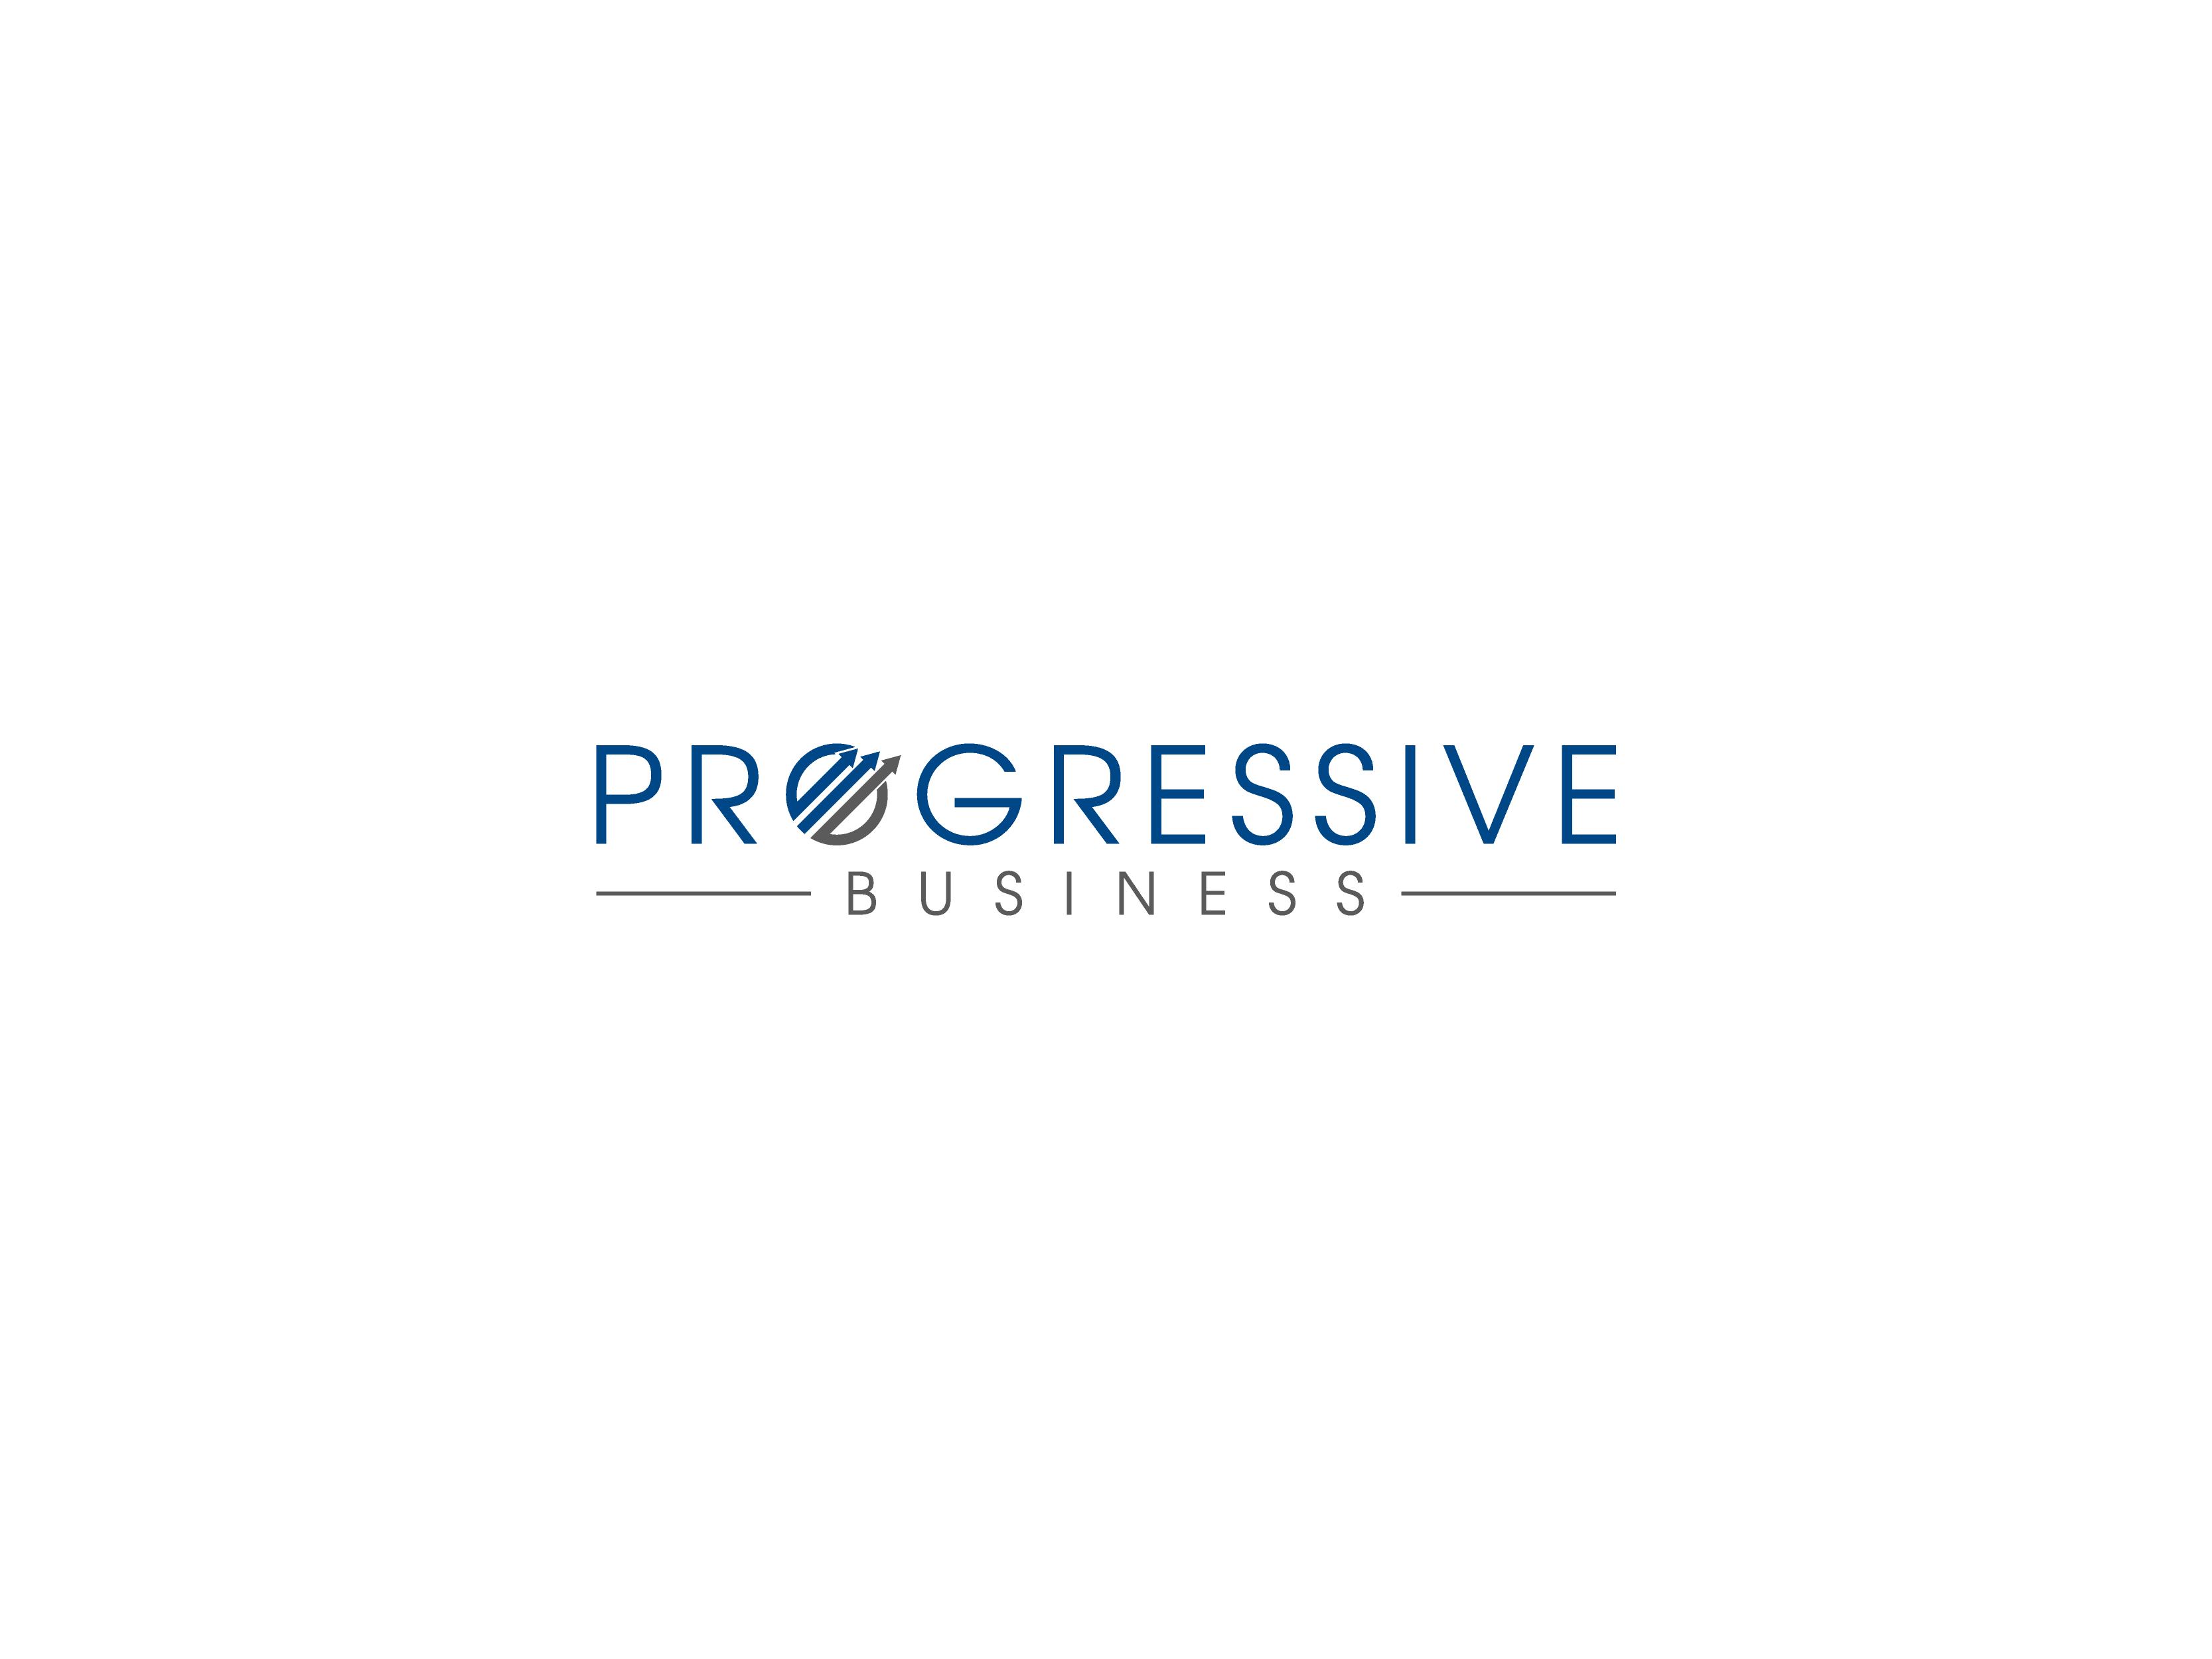 Logo Design by Shivaprasad Sangondimath - Entry No. 28 in the Logo Design Contest Captivating Logo Design for Progressive Business.